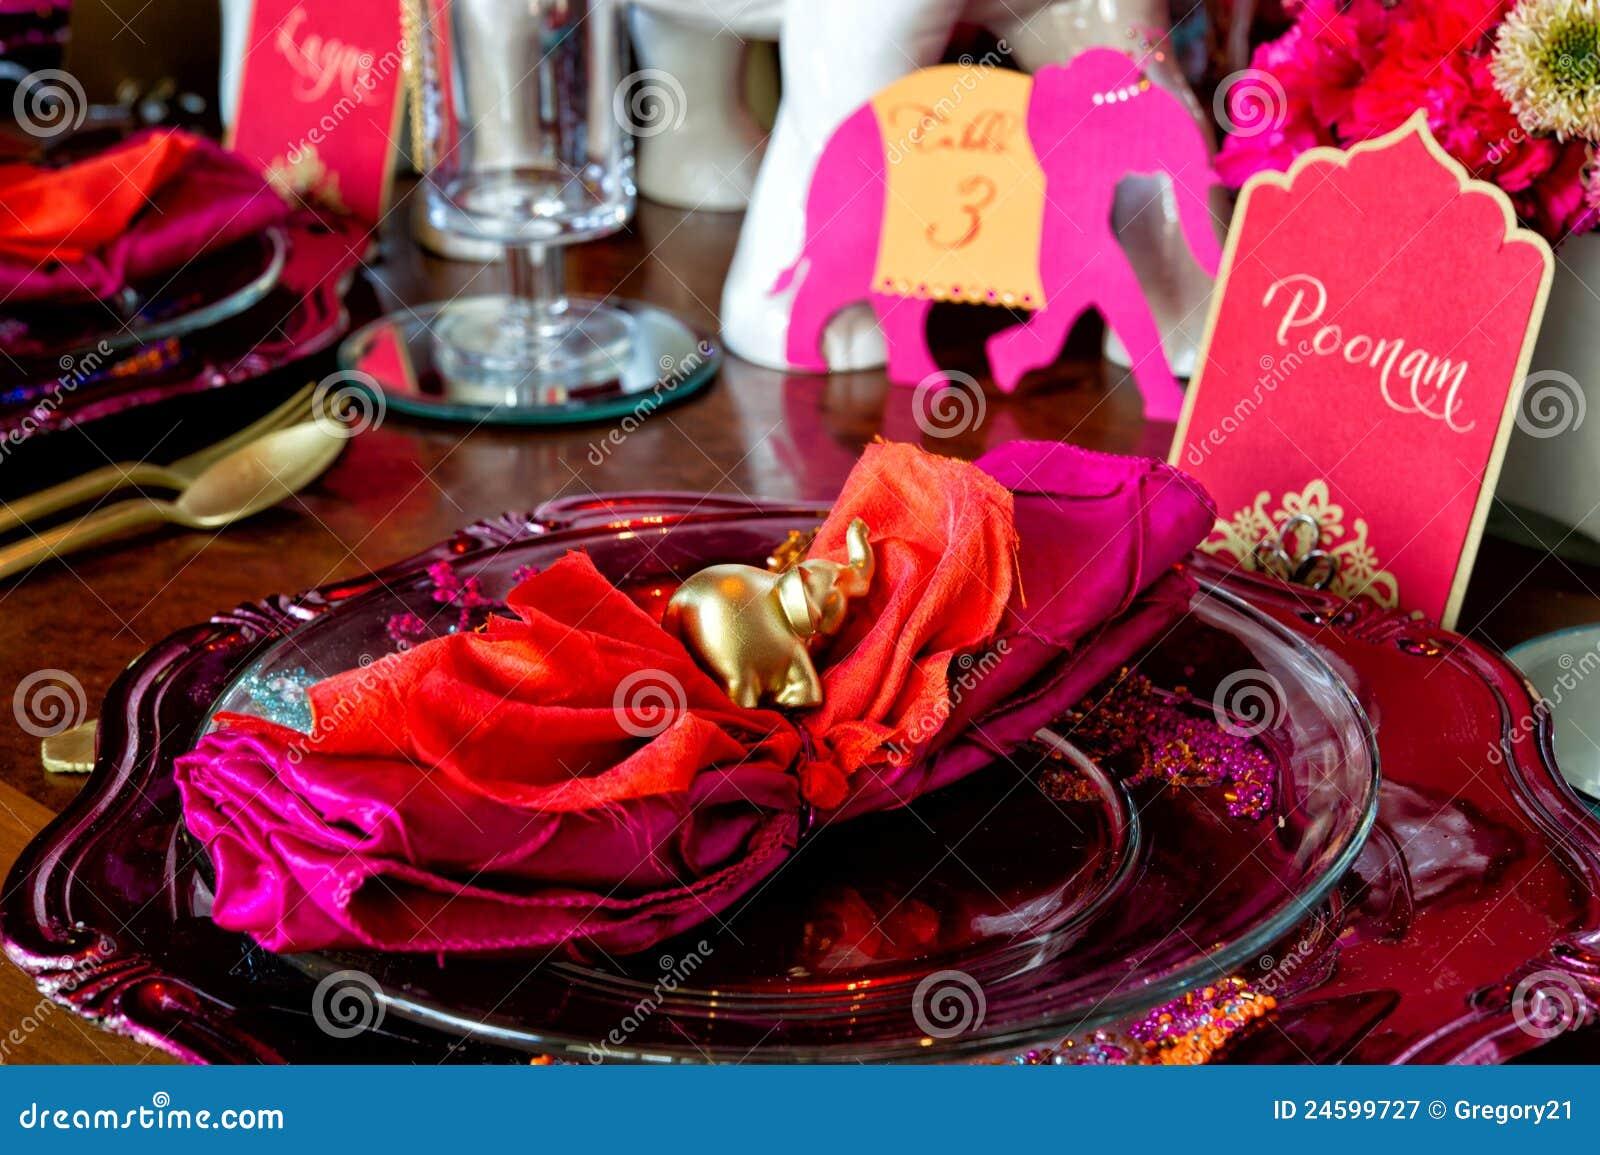 Indian Wedding Stock Image Image Of Food Dine Cutlery